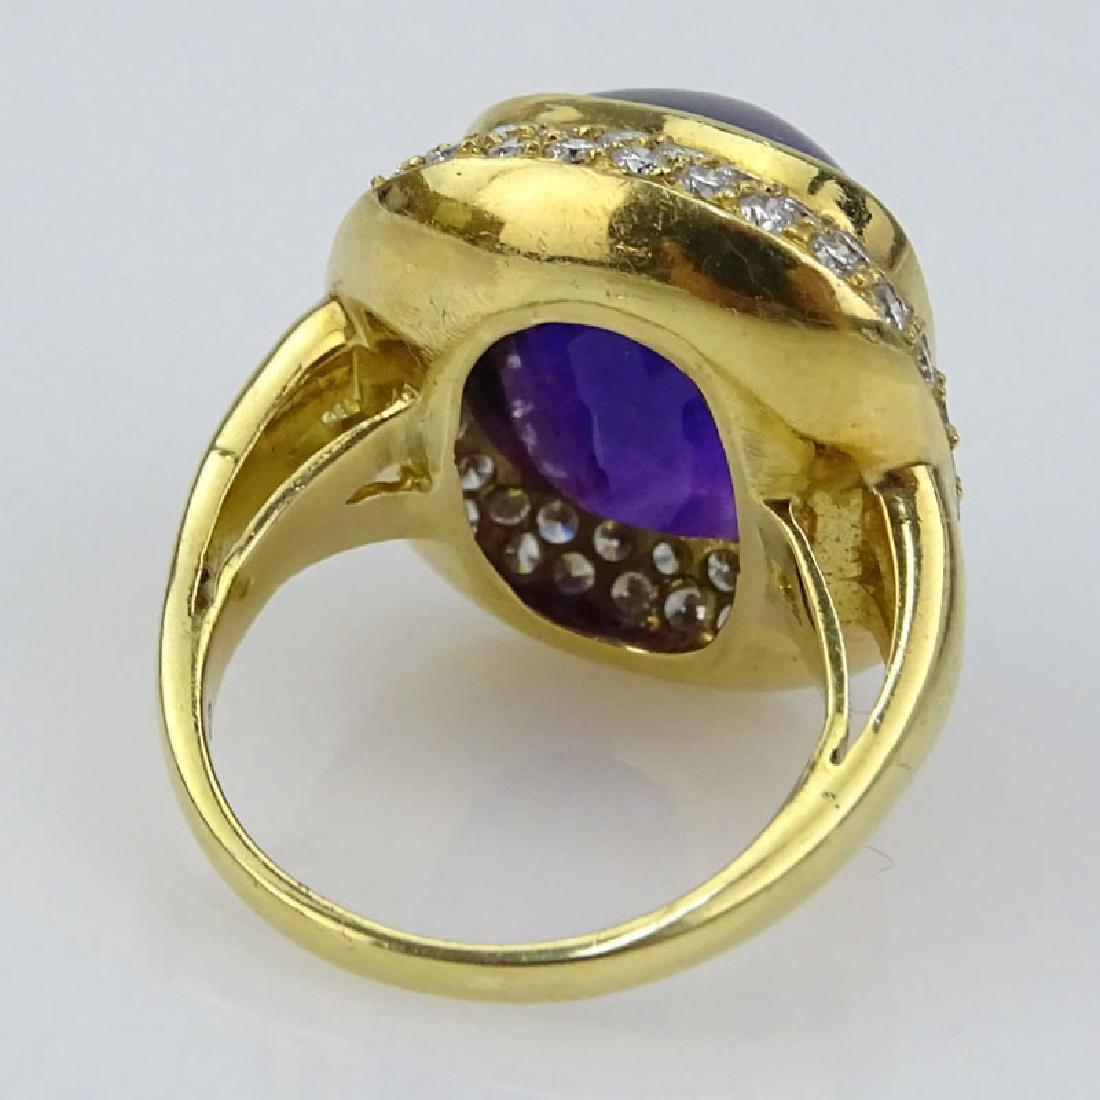 H Stern Sugarloaf Cabochon Amethyst, Pave Set Diamond - 2